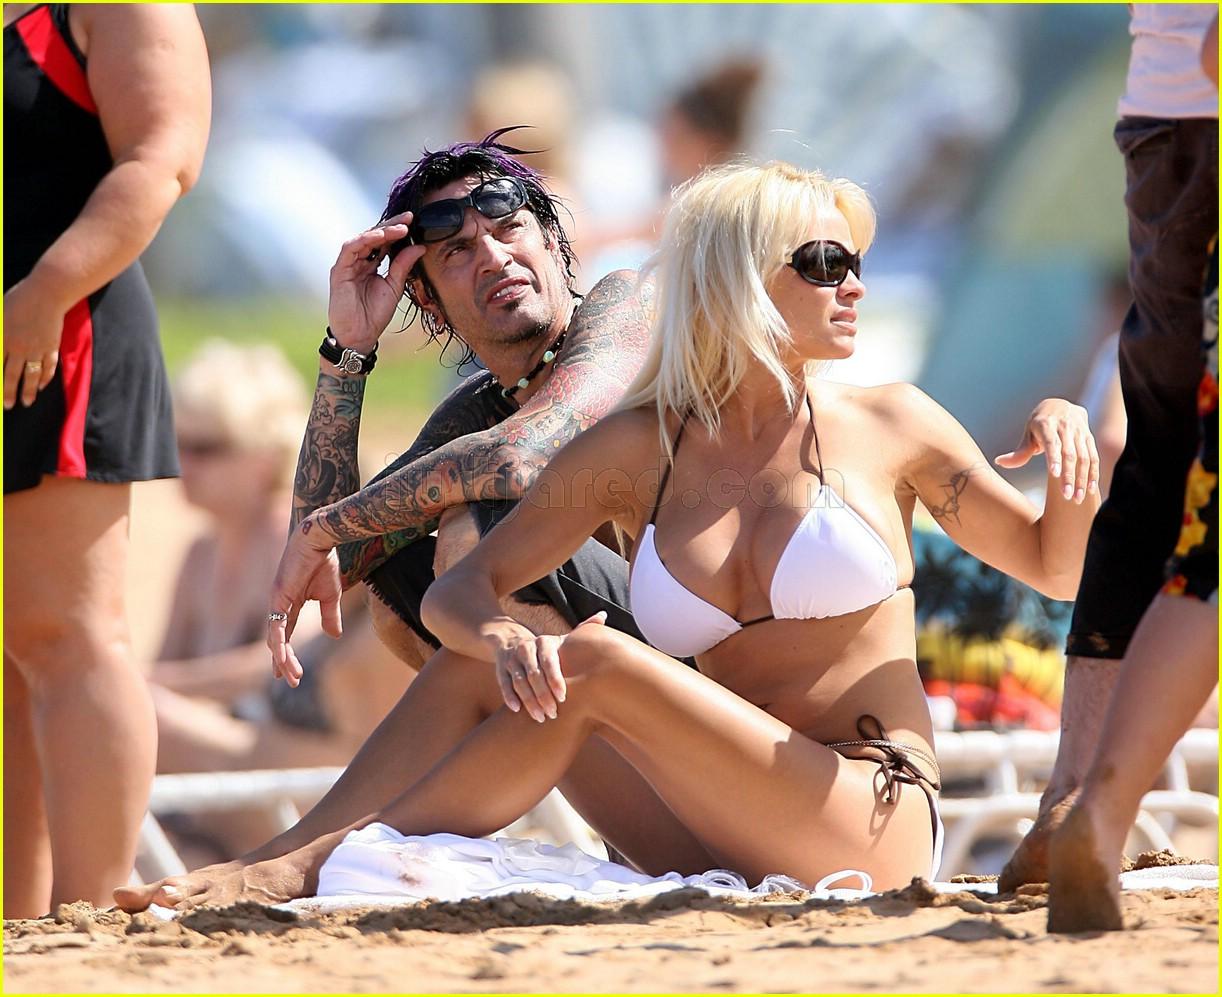 Pamela anderson tommy lee wedding bands - Pamela Pops Out In Hawaii Photo 98881 Bikini Celebrity Babies Pamela Anderson Shirtless Tommy Lee Pictures Just Jared